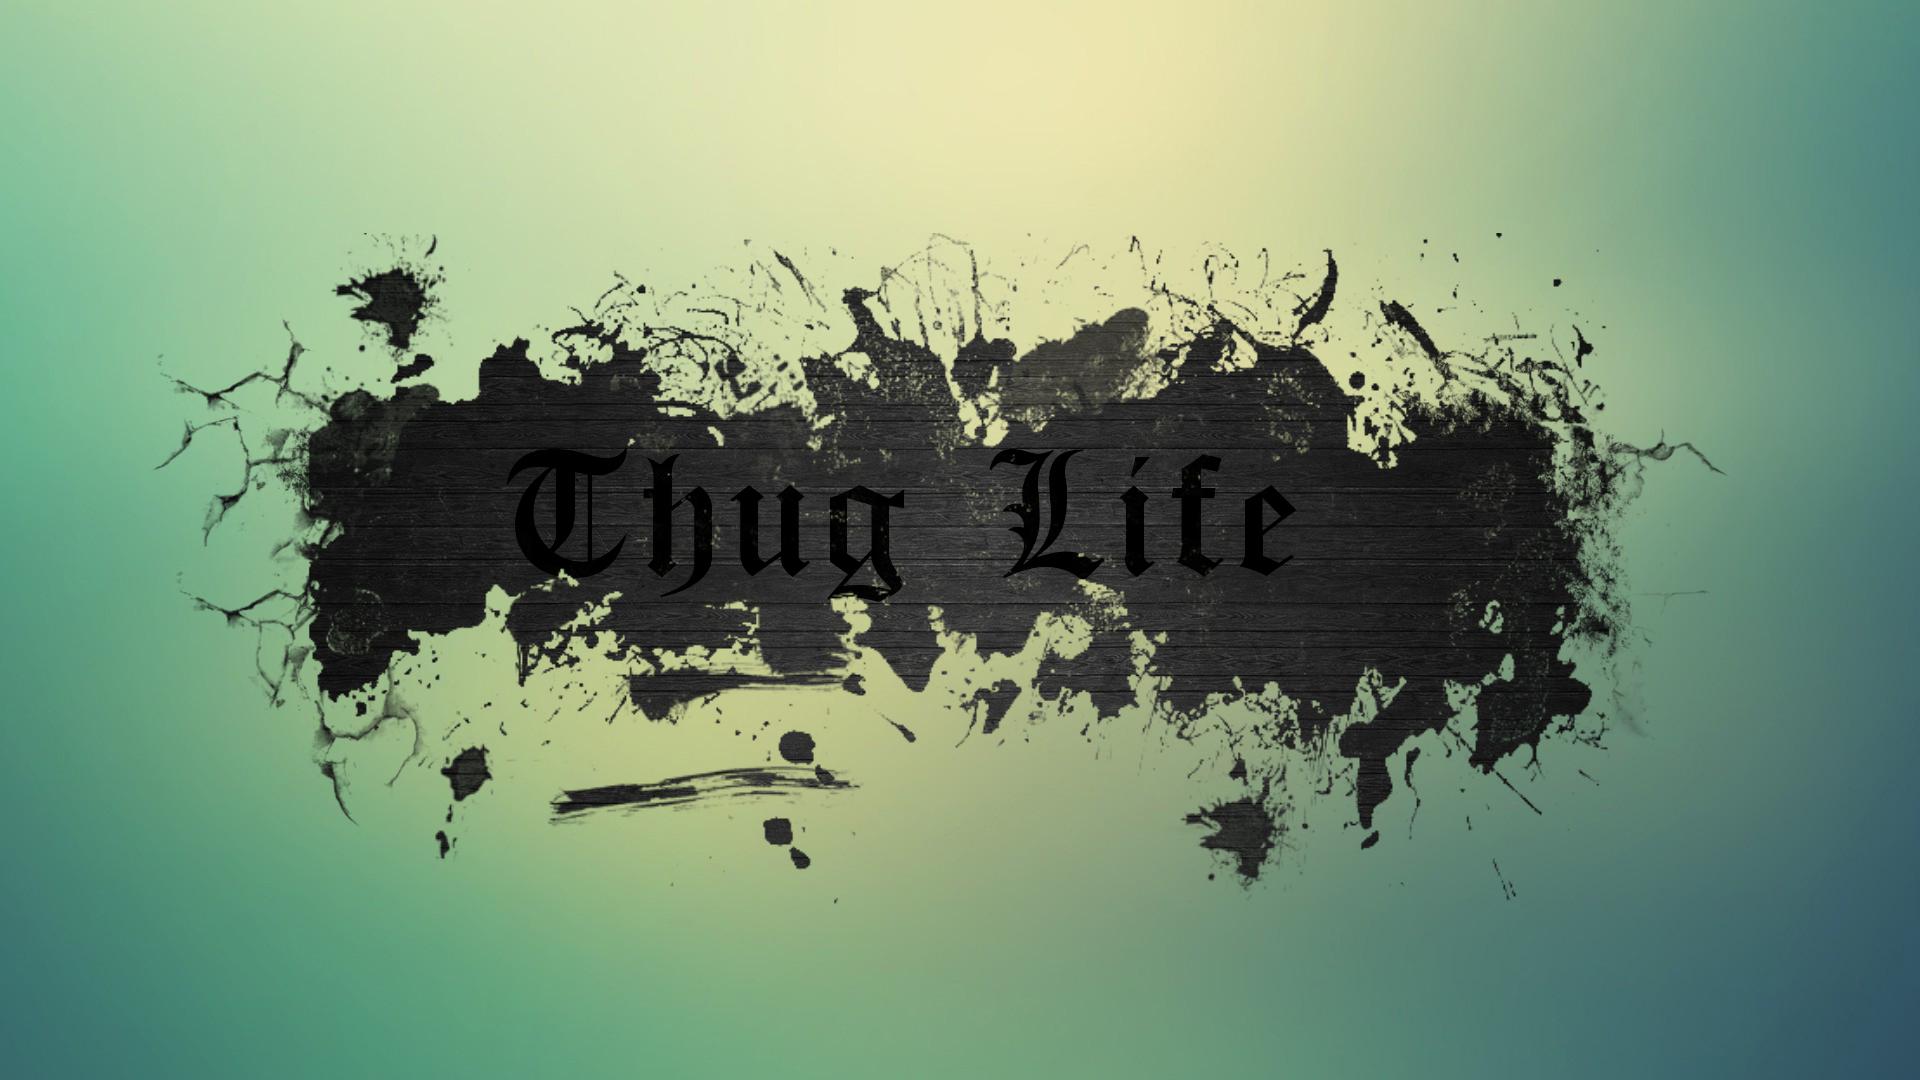 Thug Life by curtisblade 1920x1080